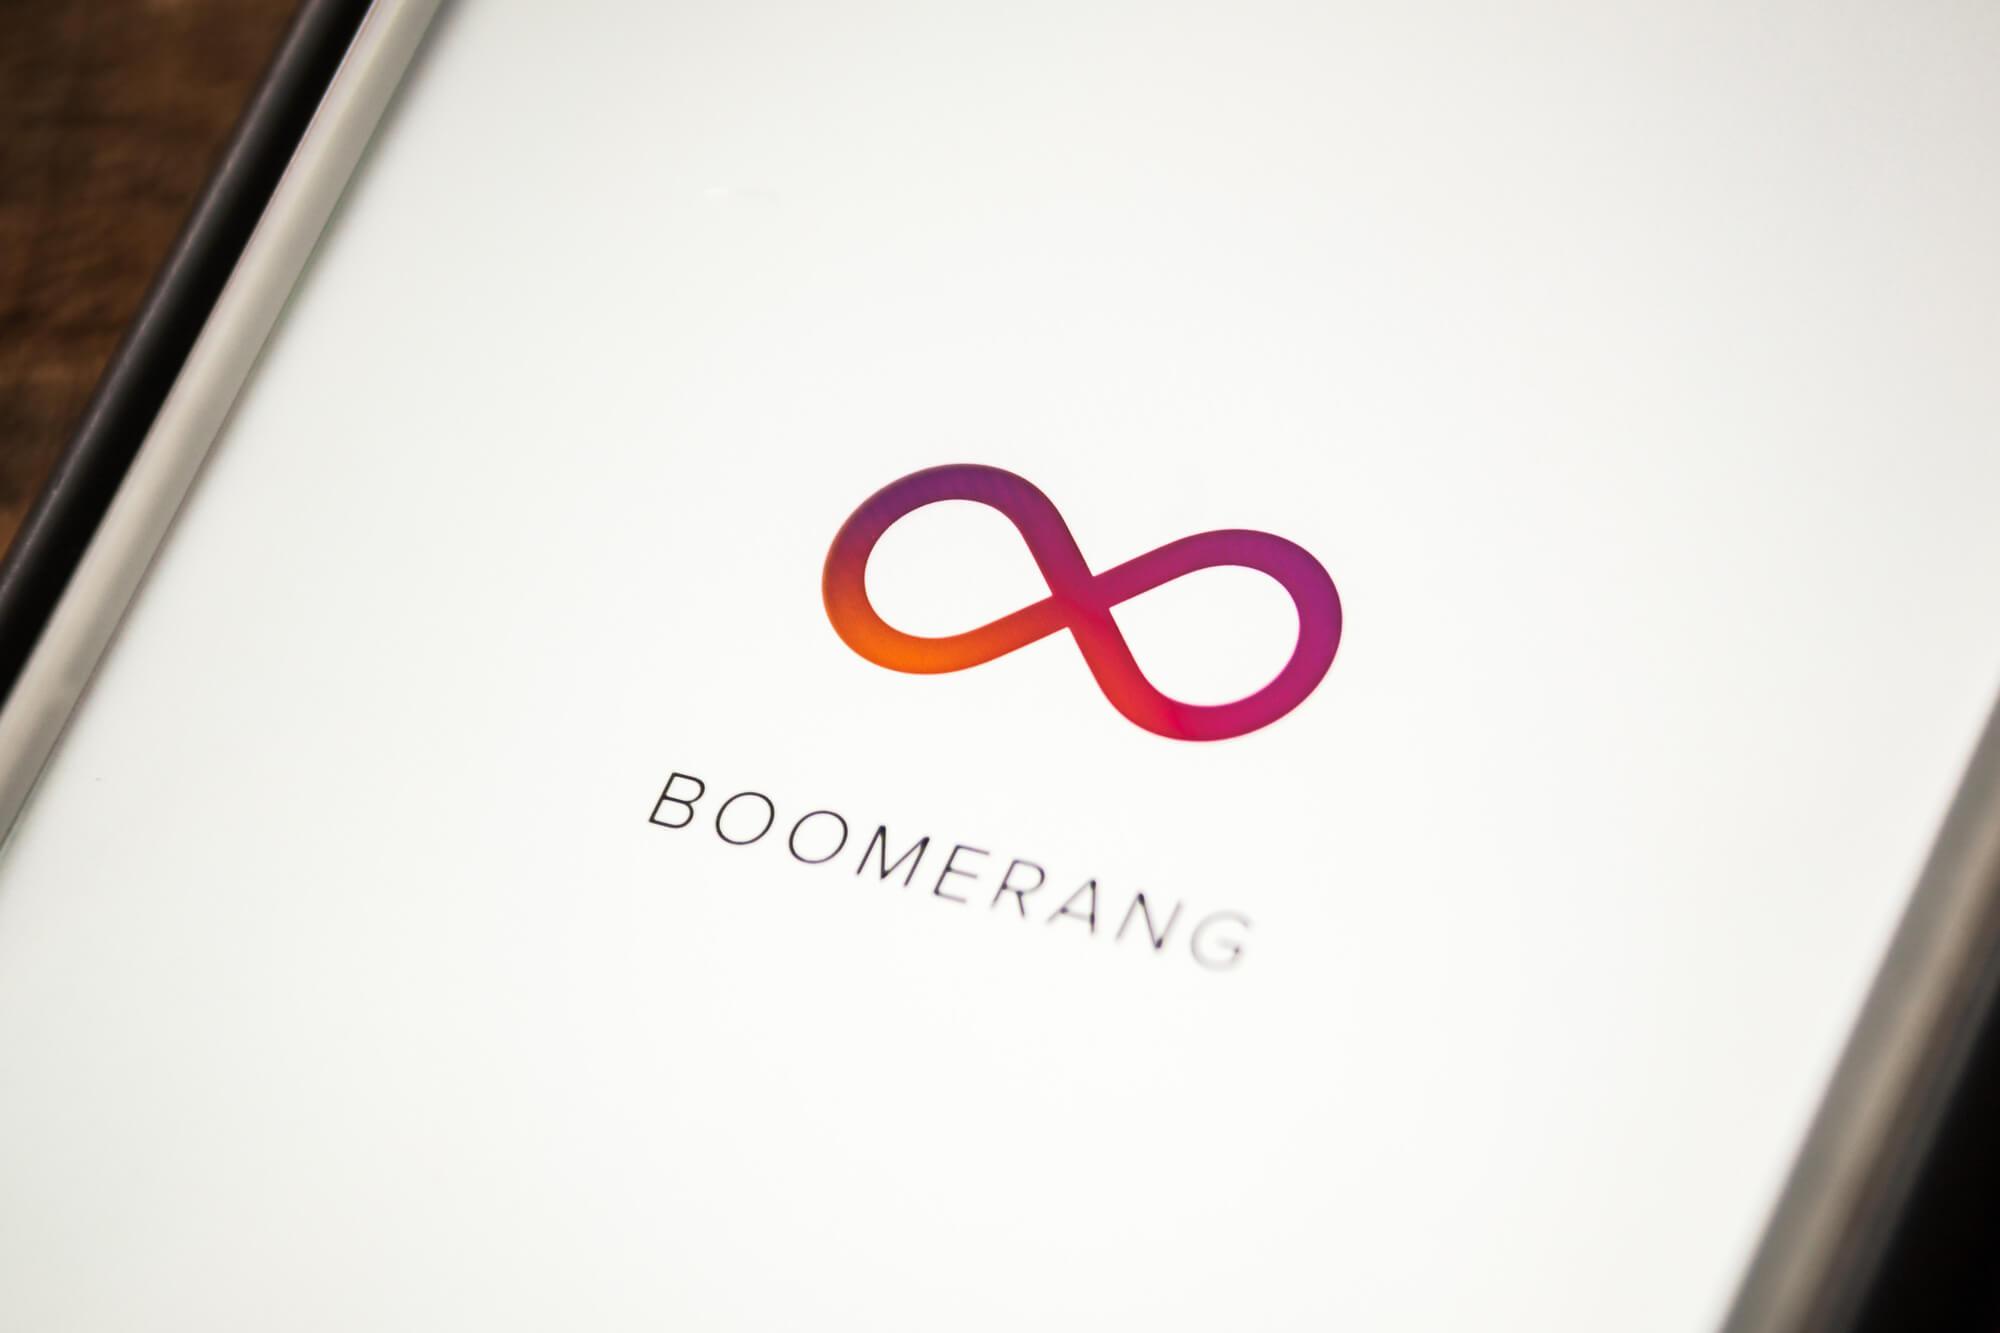 boomerang-logo-instagram